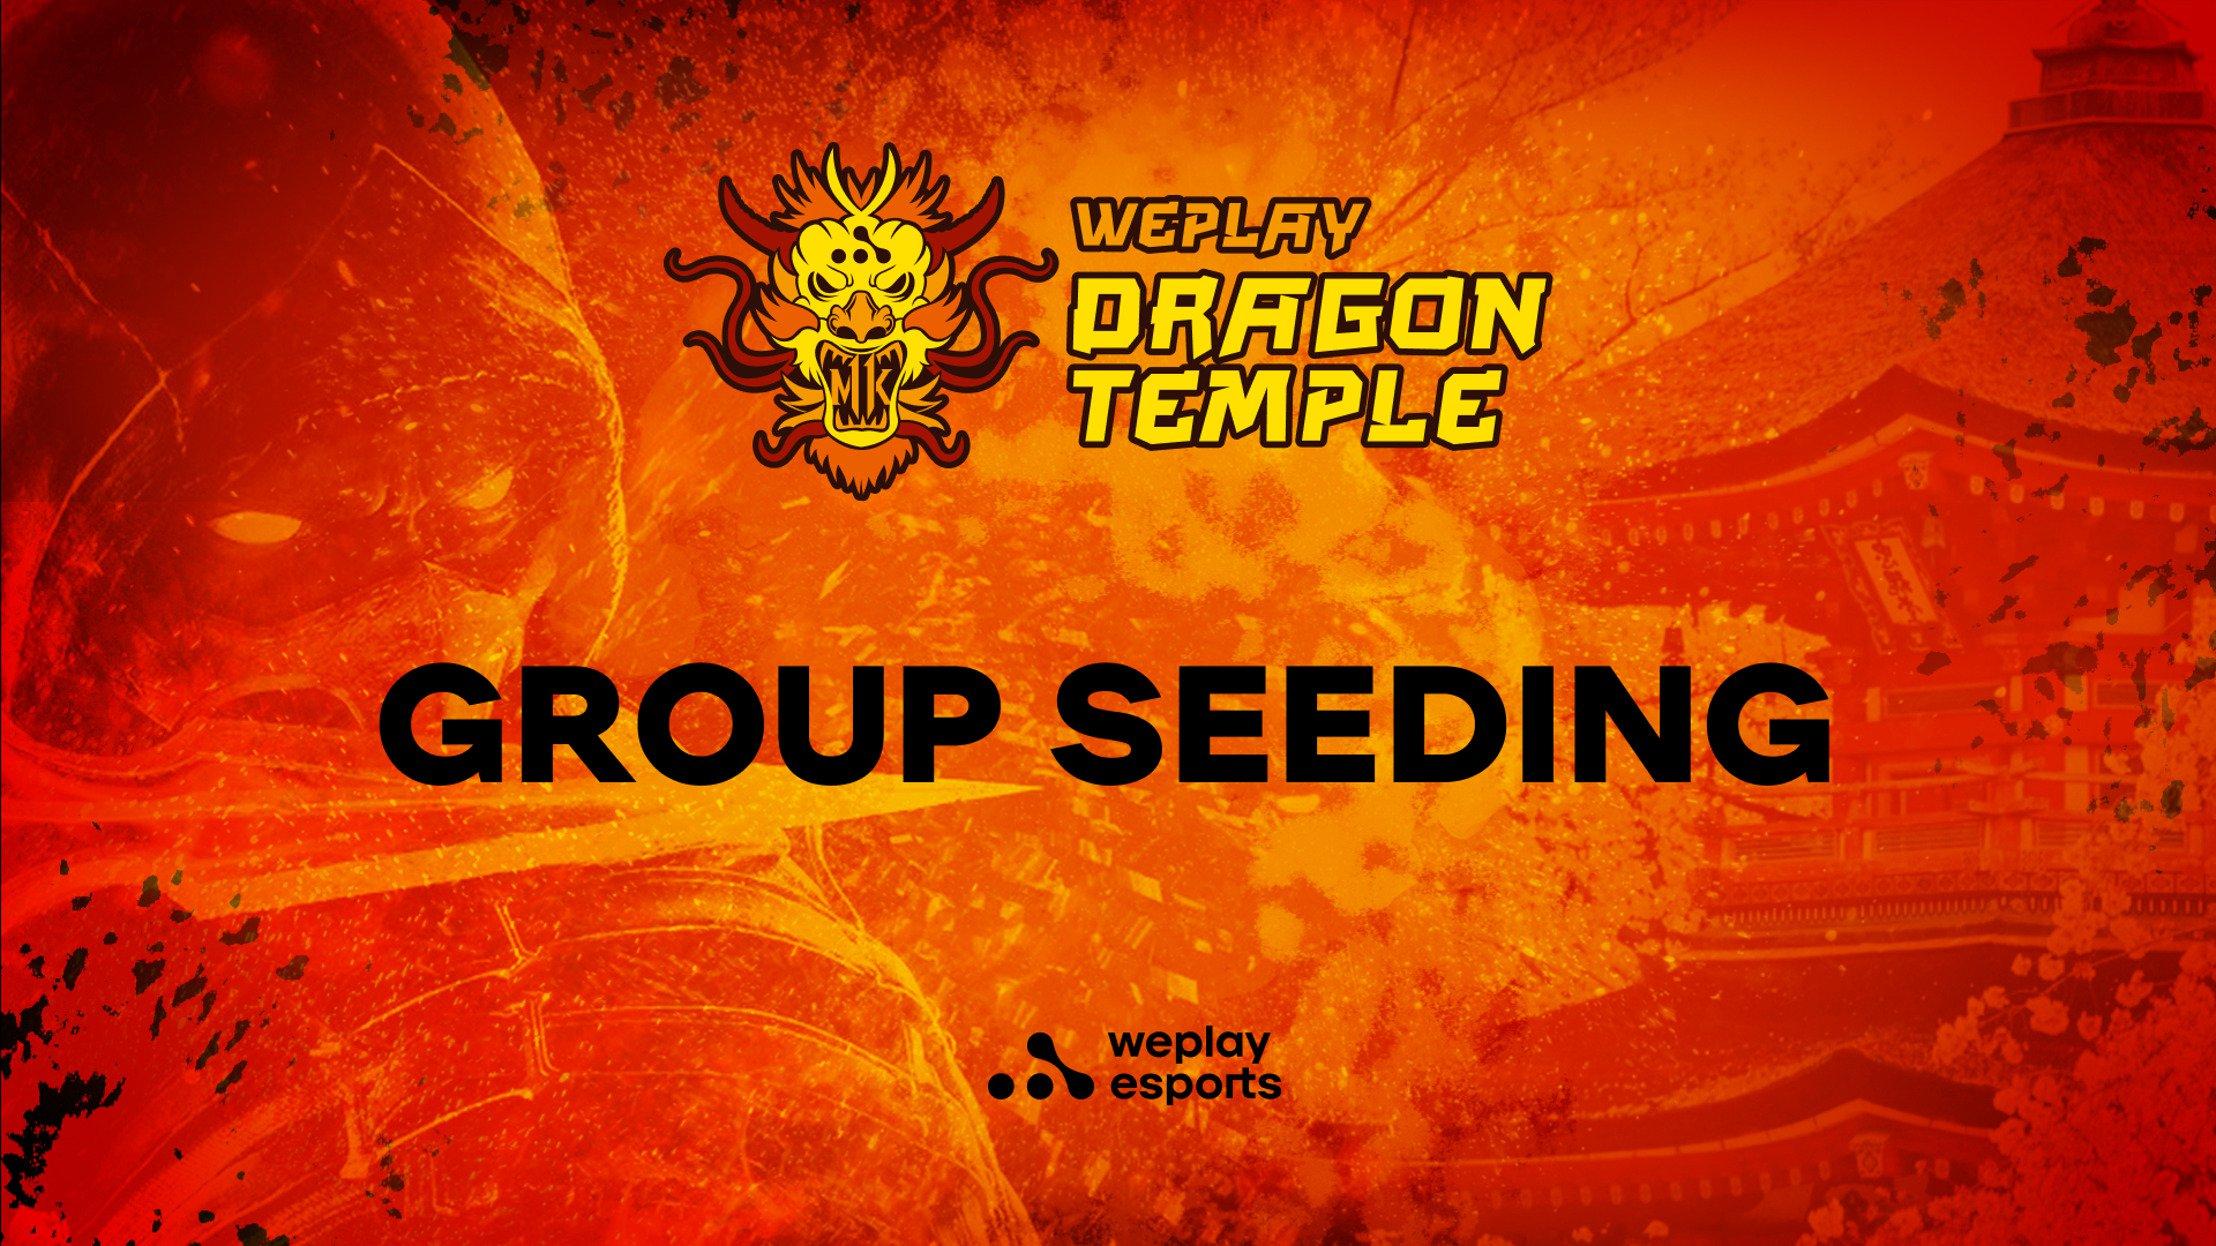 WePlay Dragon Temple Group Seeding